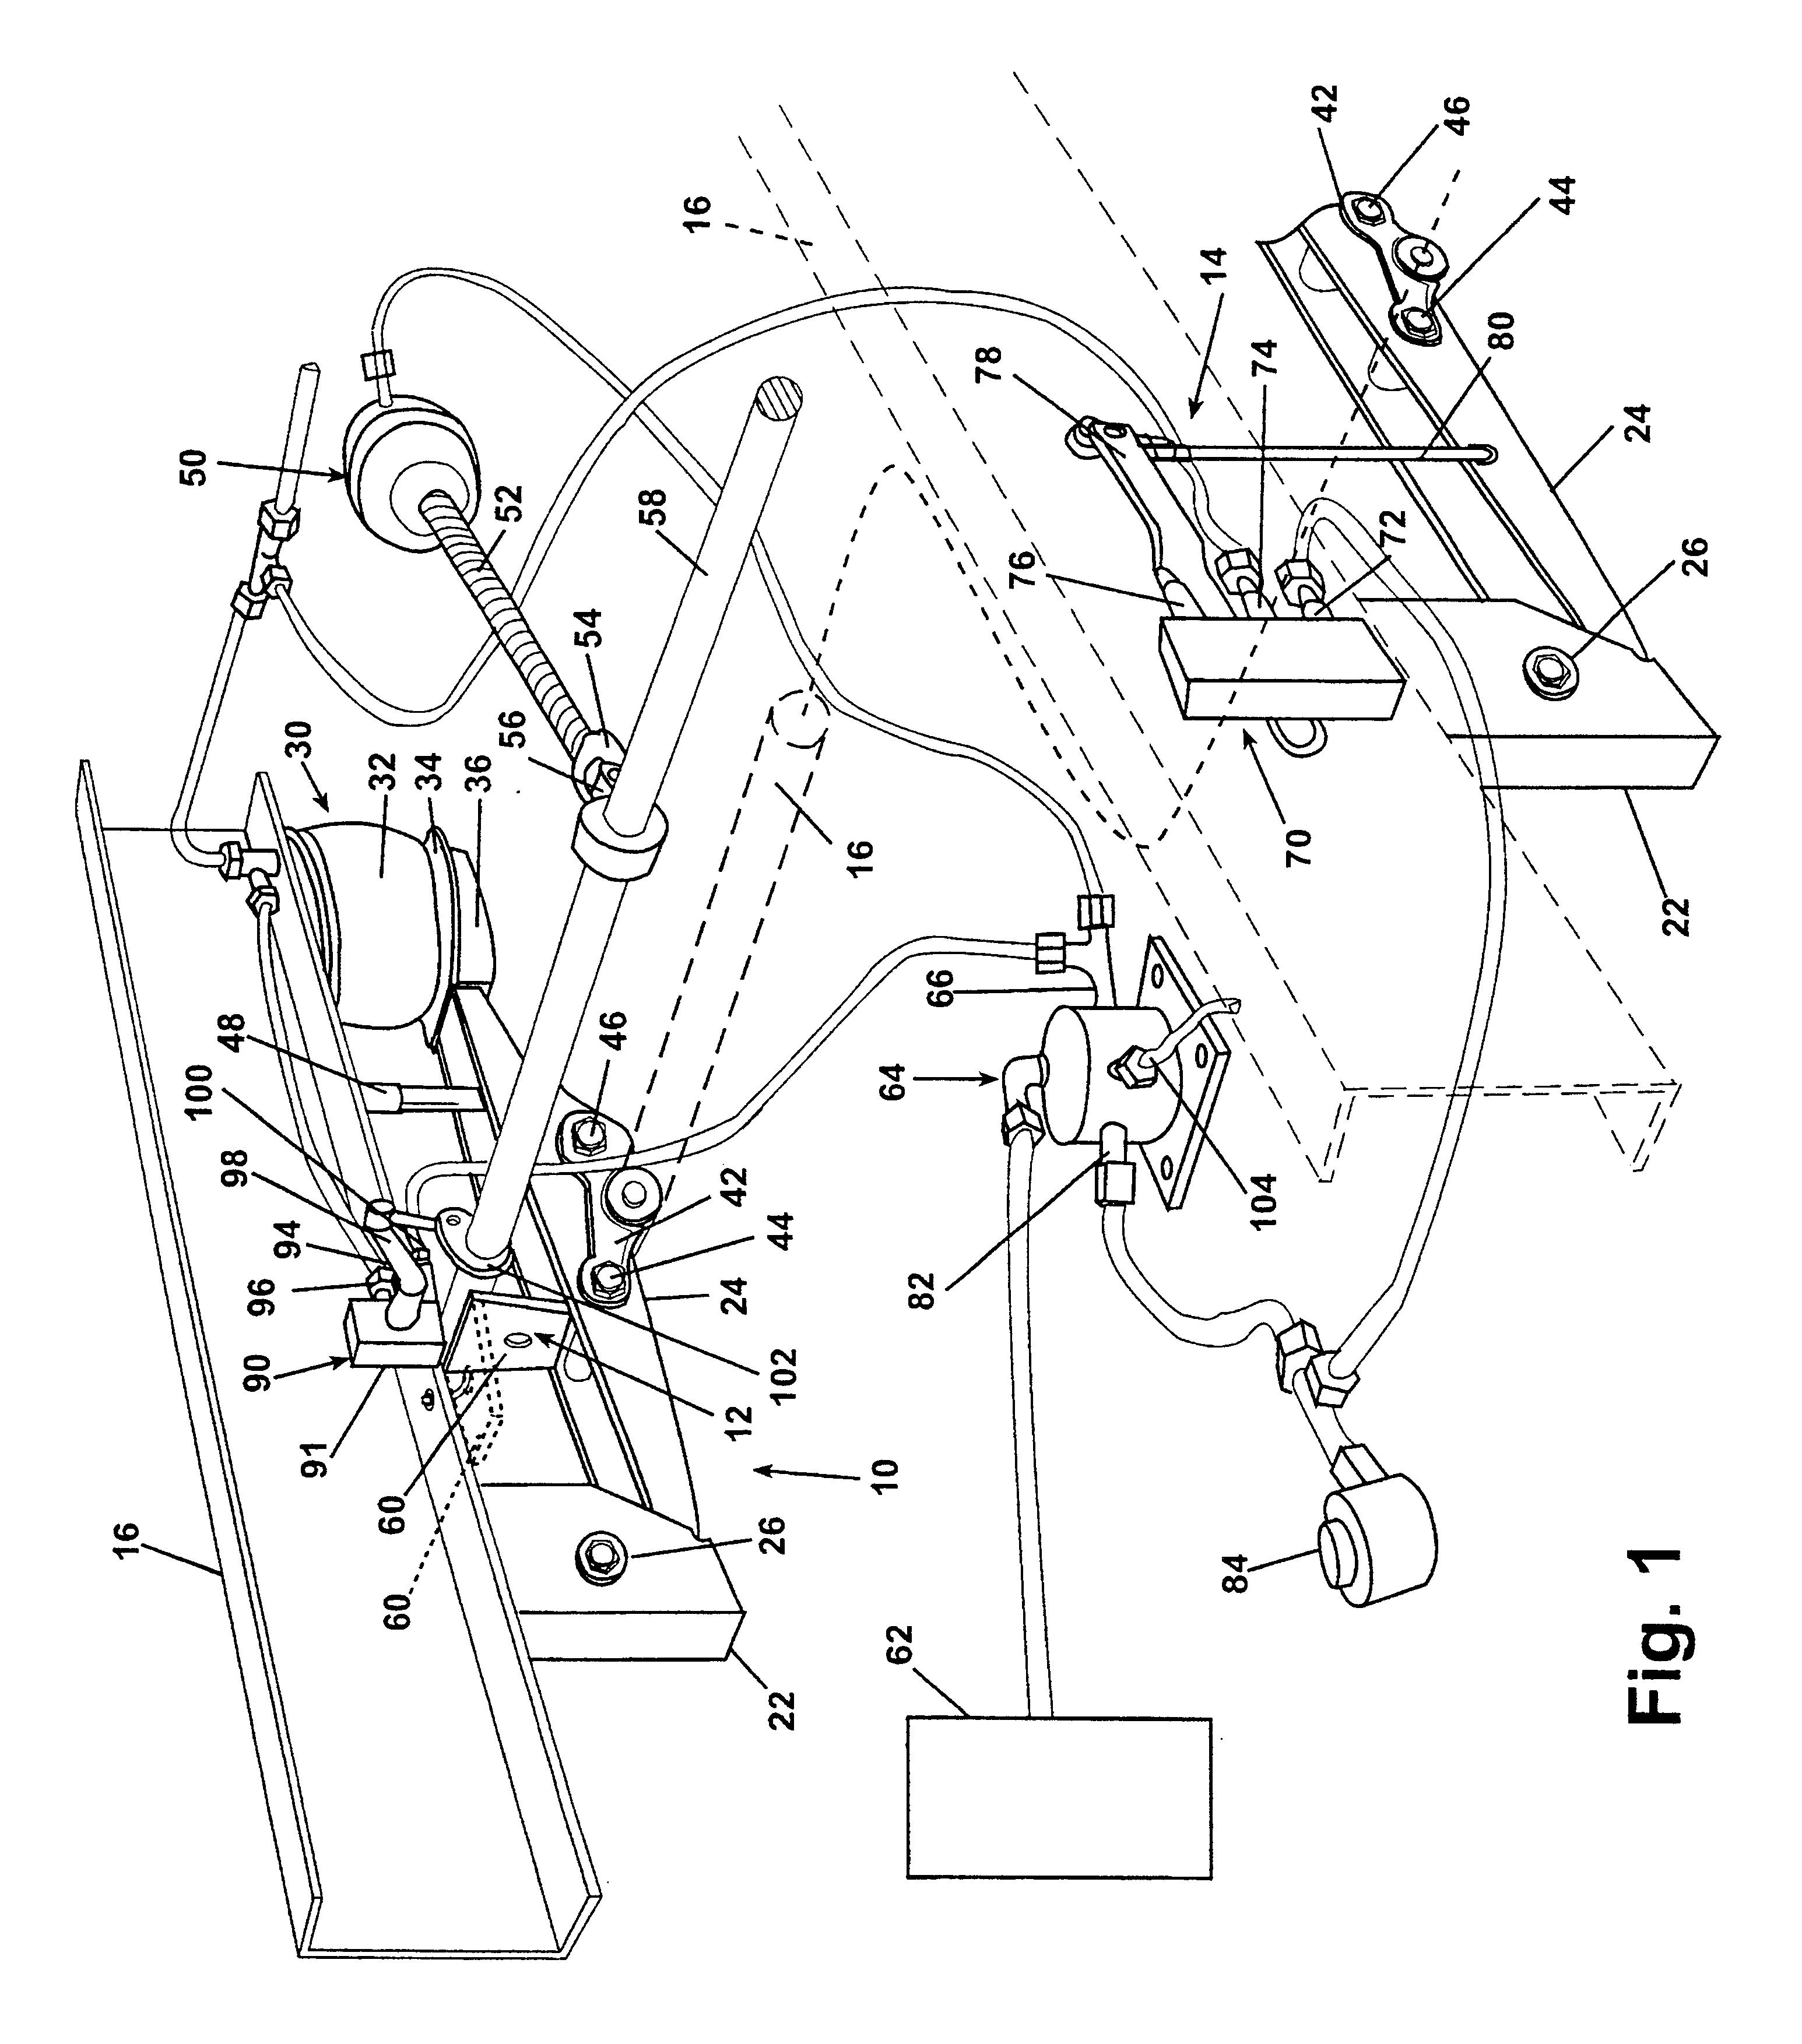 patent us6679509 - trailing arm suspension with anti-creep automatic reset